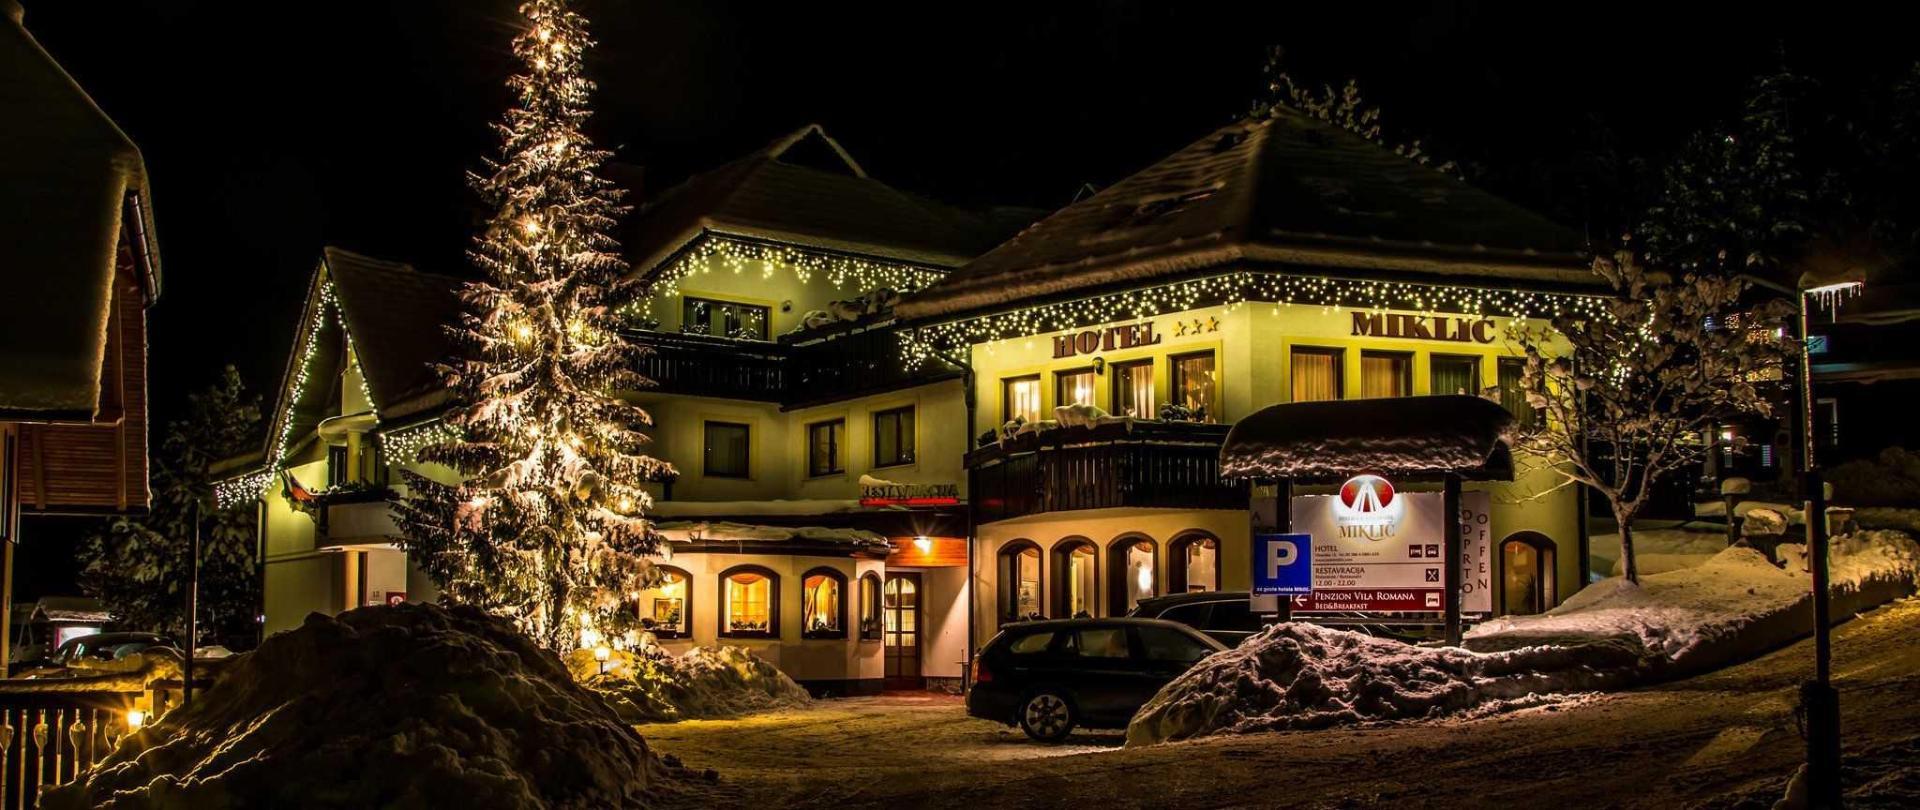 zunanjost-hotel-miklic-zimska-2017-nocna-by-kosir-bogomir.JPG